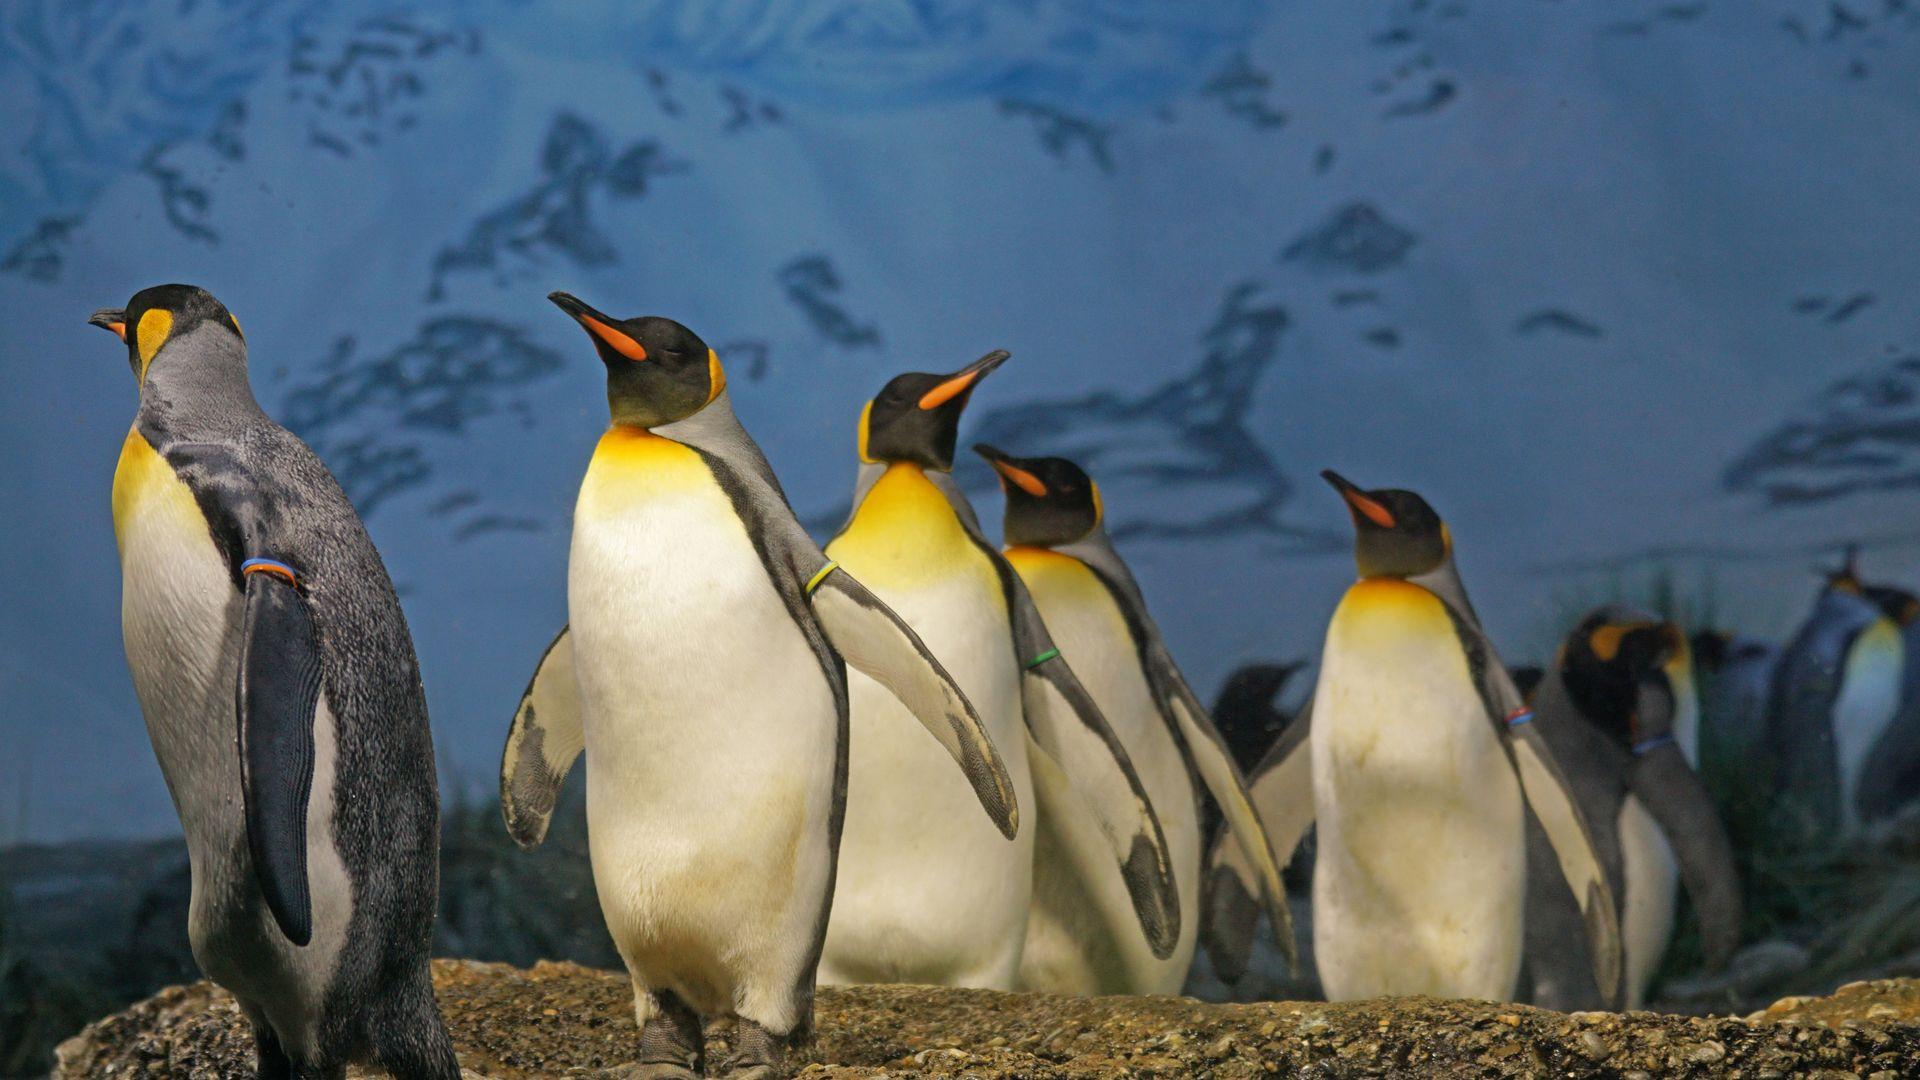 King Penguin Daylight Outdoor HD Wallpaper   Wallpaper Stream 1920x1080